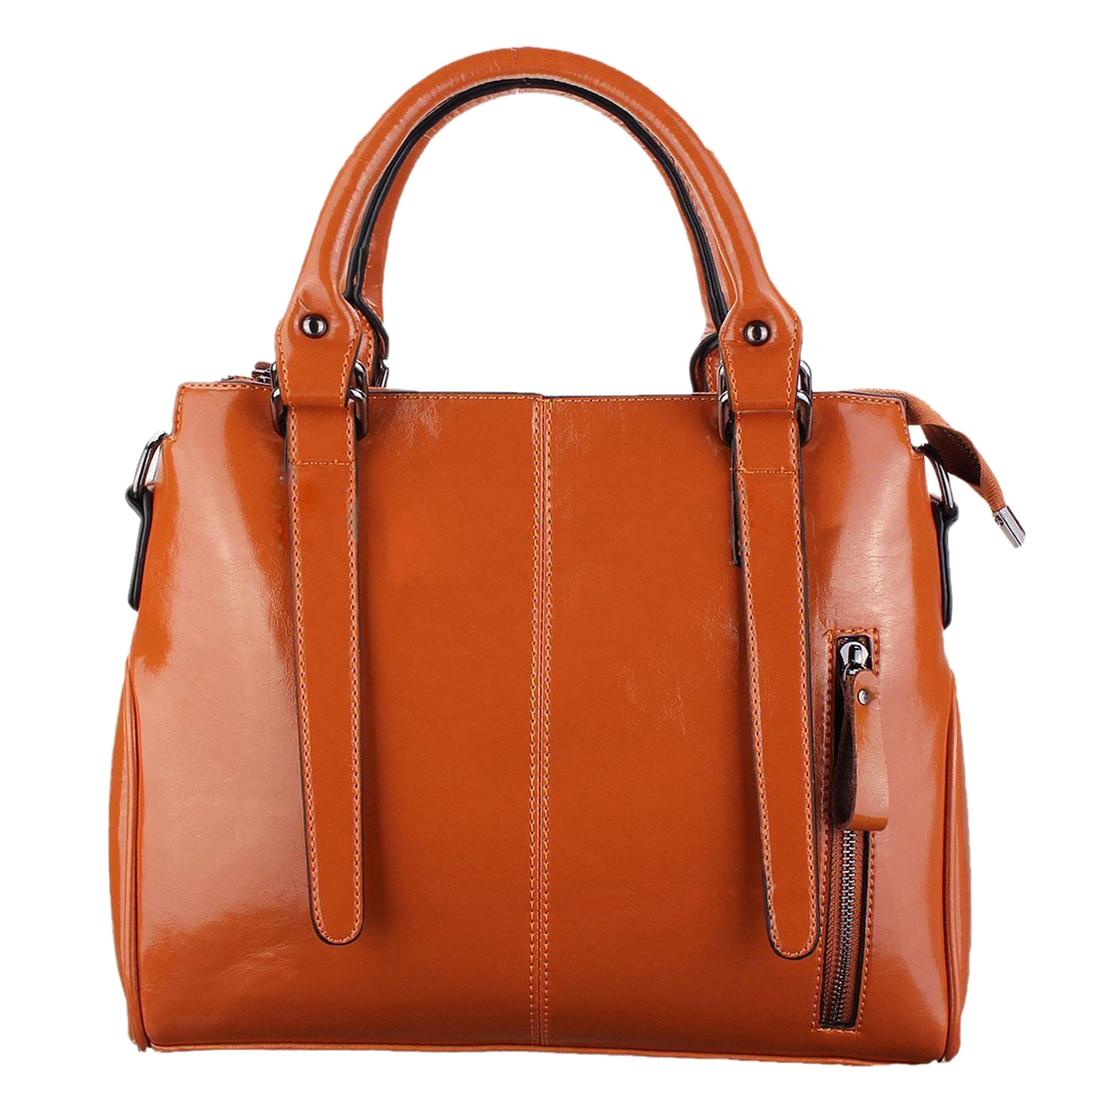 2 Pcs of (Women Leather Handbag Shoulder Bag Tote Messenger Crossbody Bag Ladies Satchel Purse Brown storage classification) fashion women handbag shoulder bag leather messenger bag satchel tote purse l228